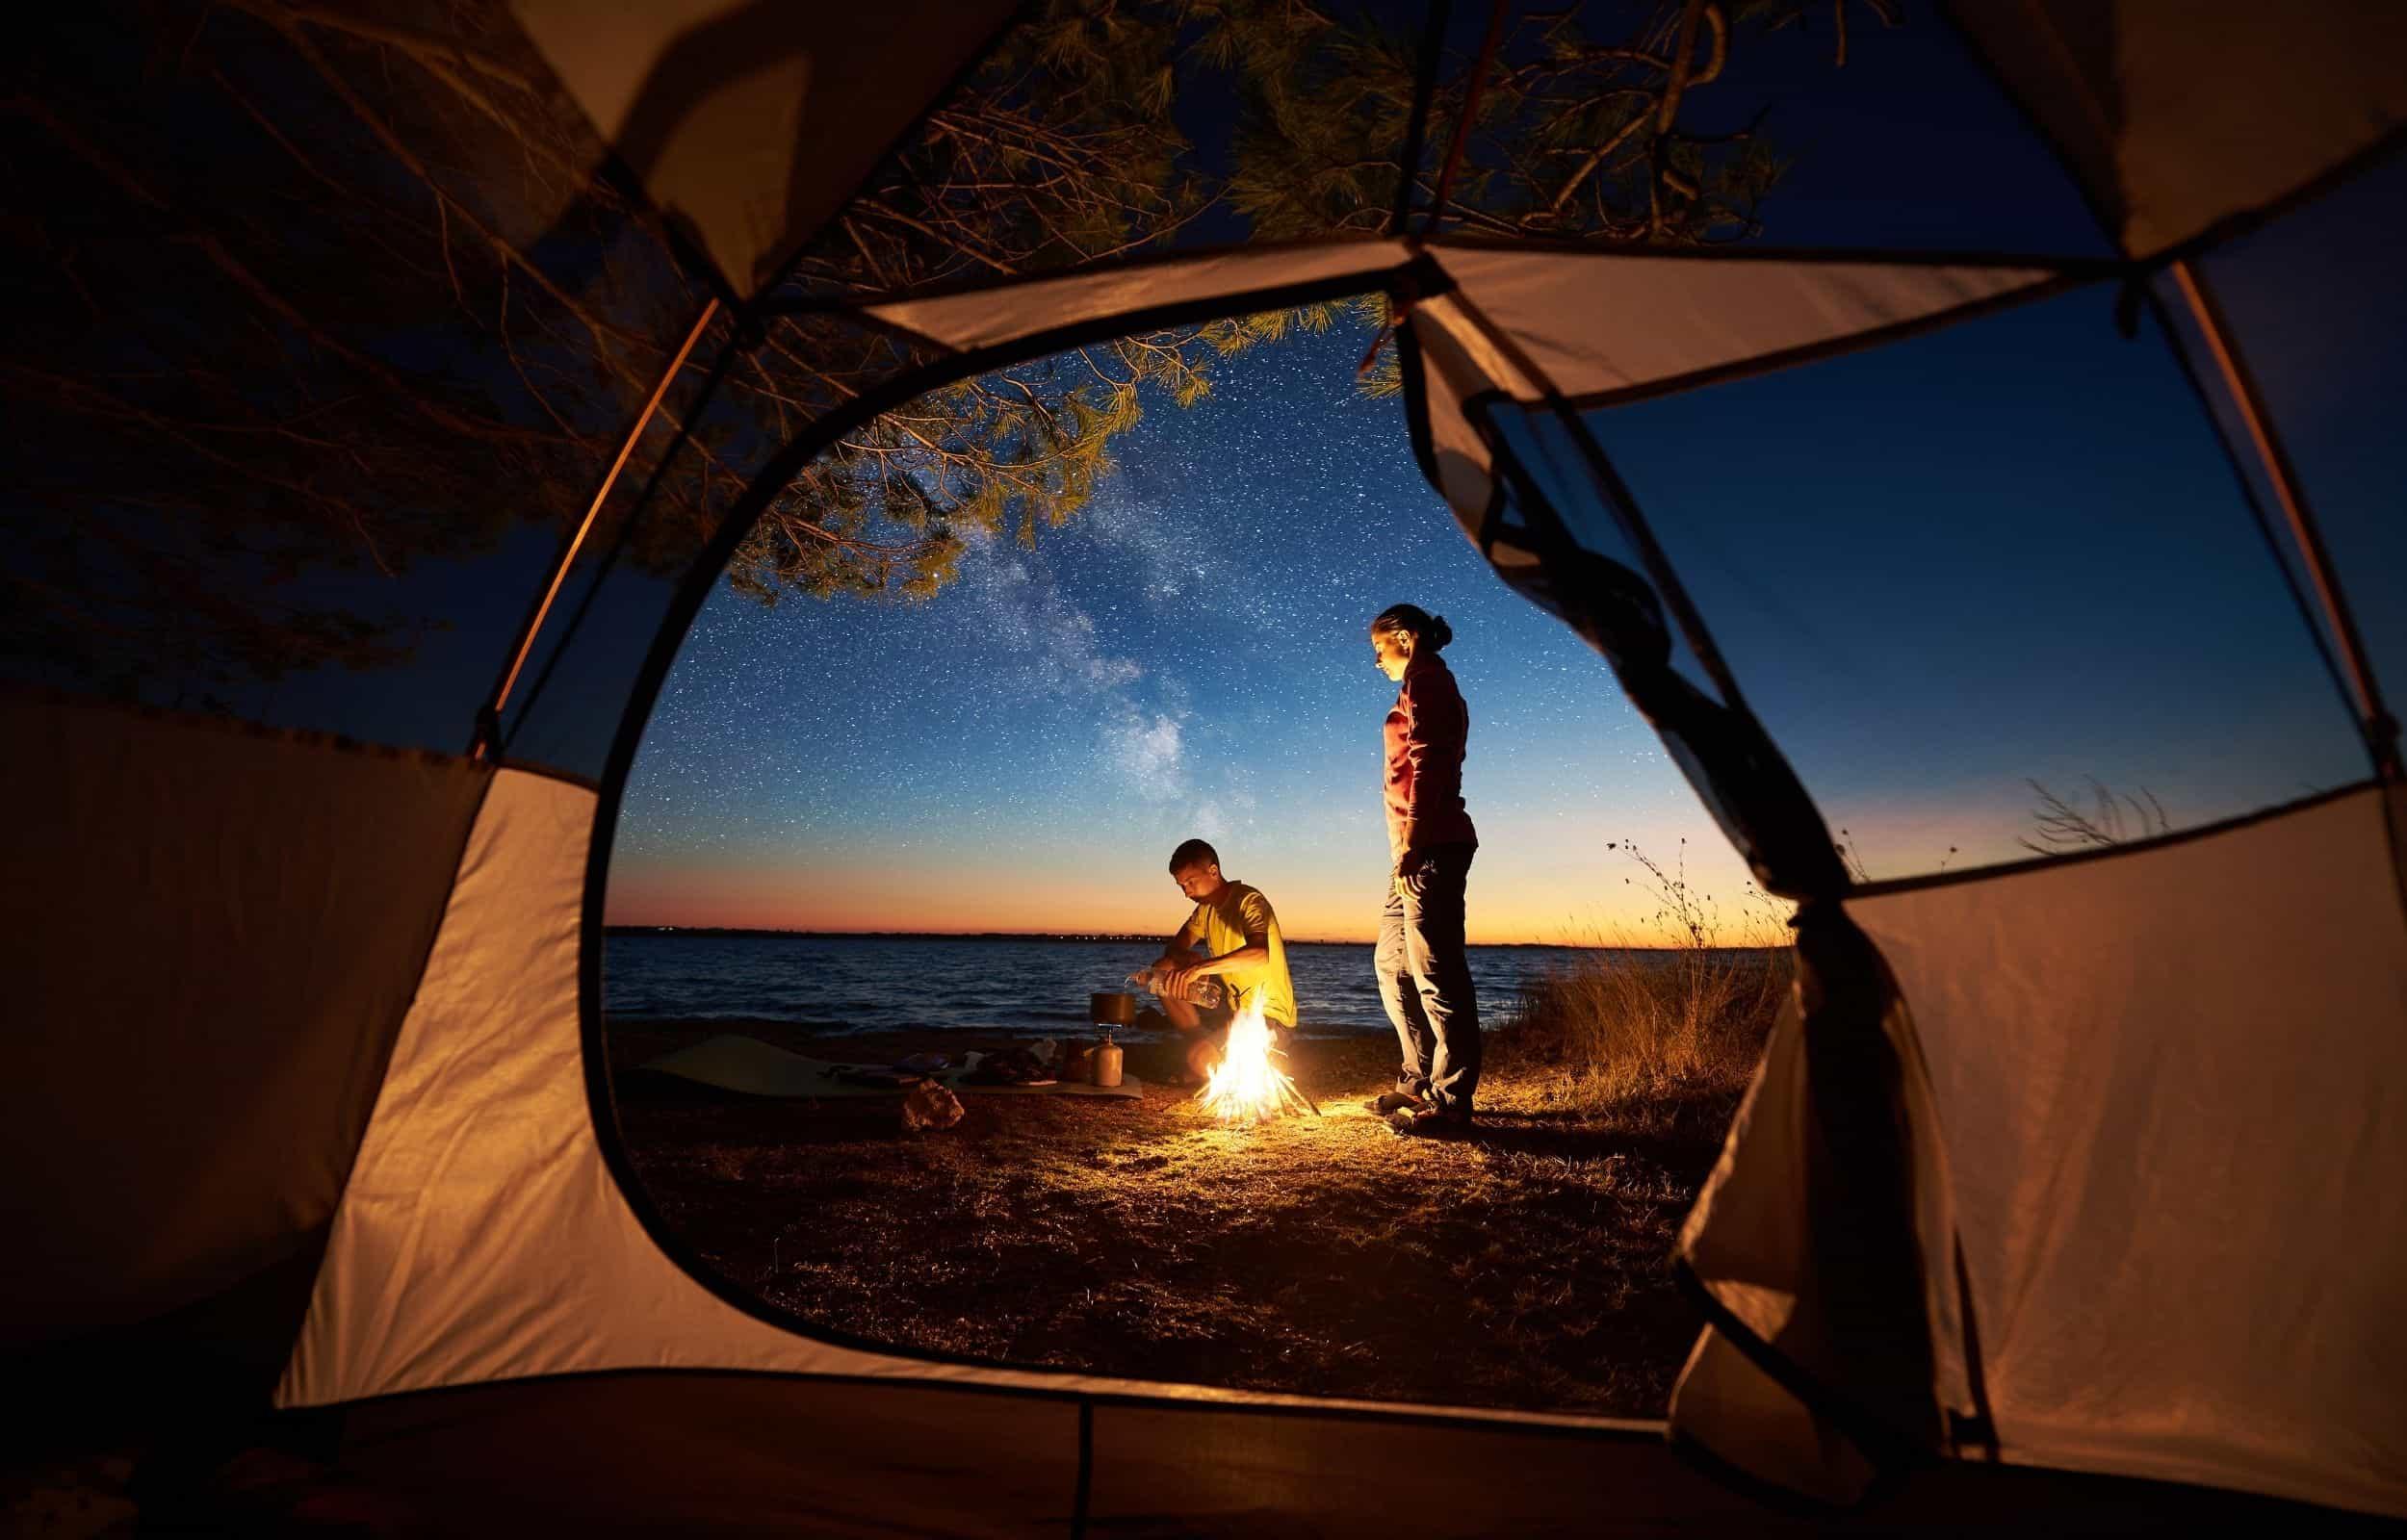 Tent night sky couple